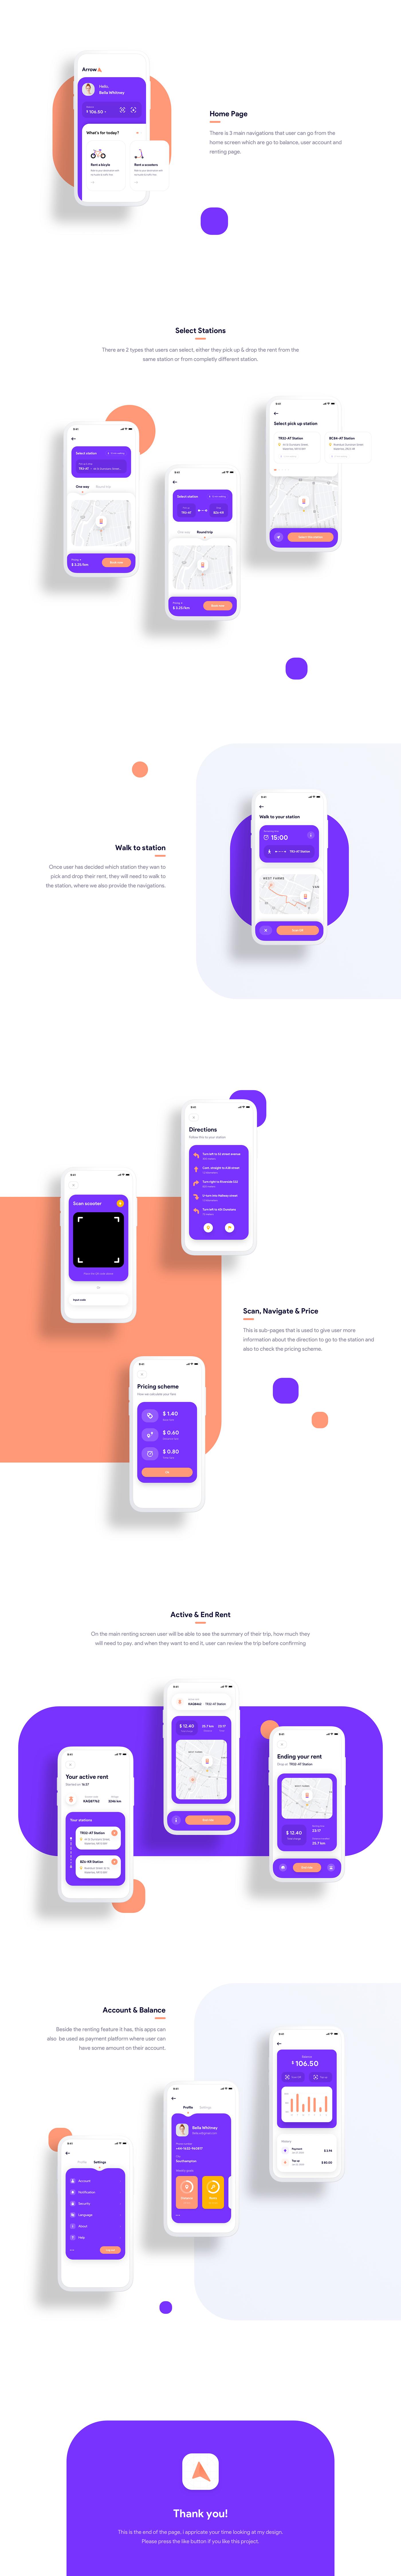 Interaction design  Mobile Application Mobile apps ui design user design user experience user interface UX design ux/ui Web Design